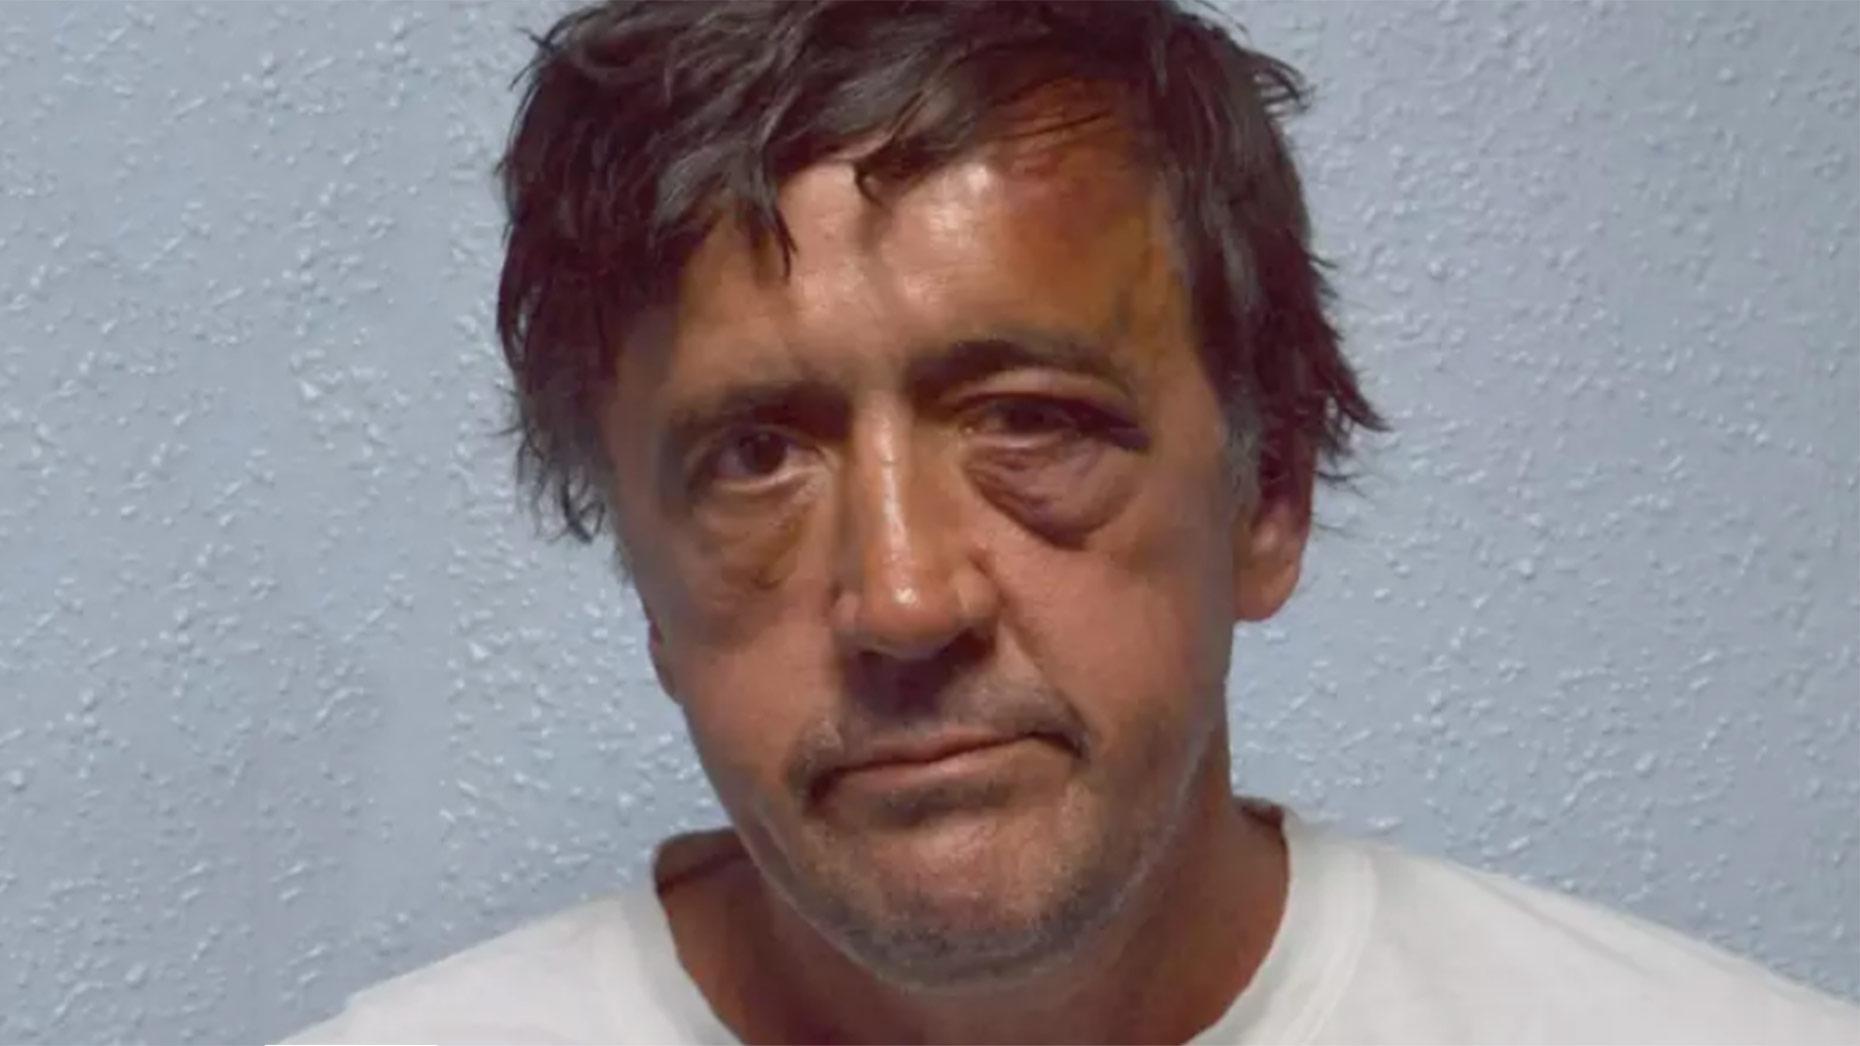 Finsbury Park terrorist Darren Osborne was Lincolnshire schoolboy